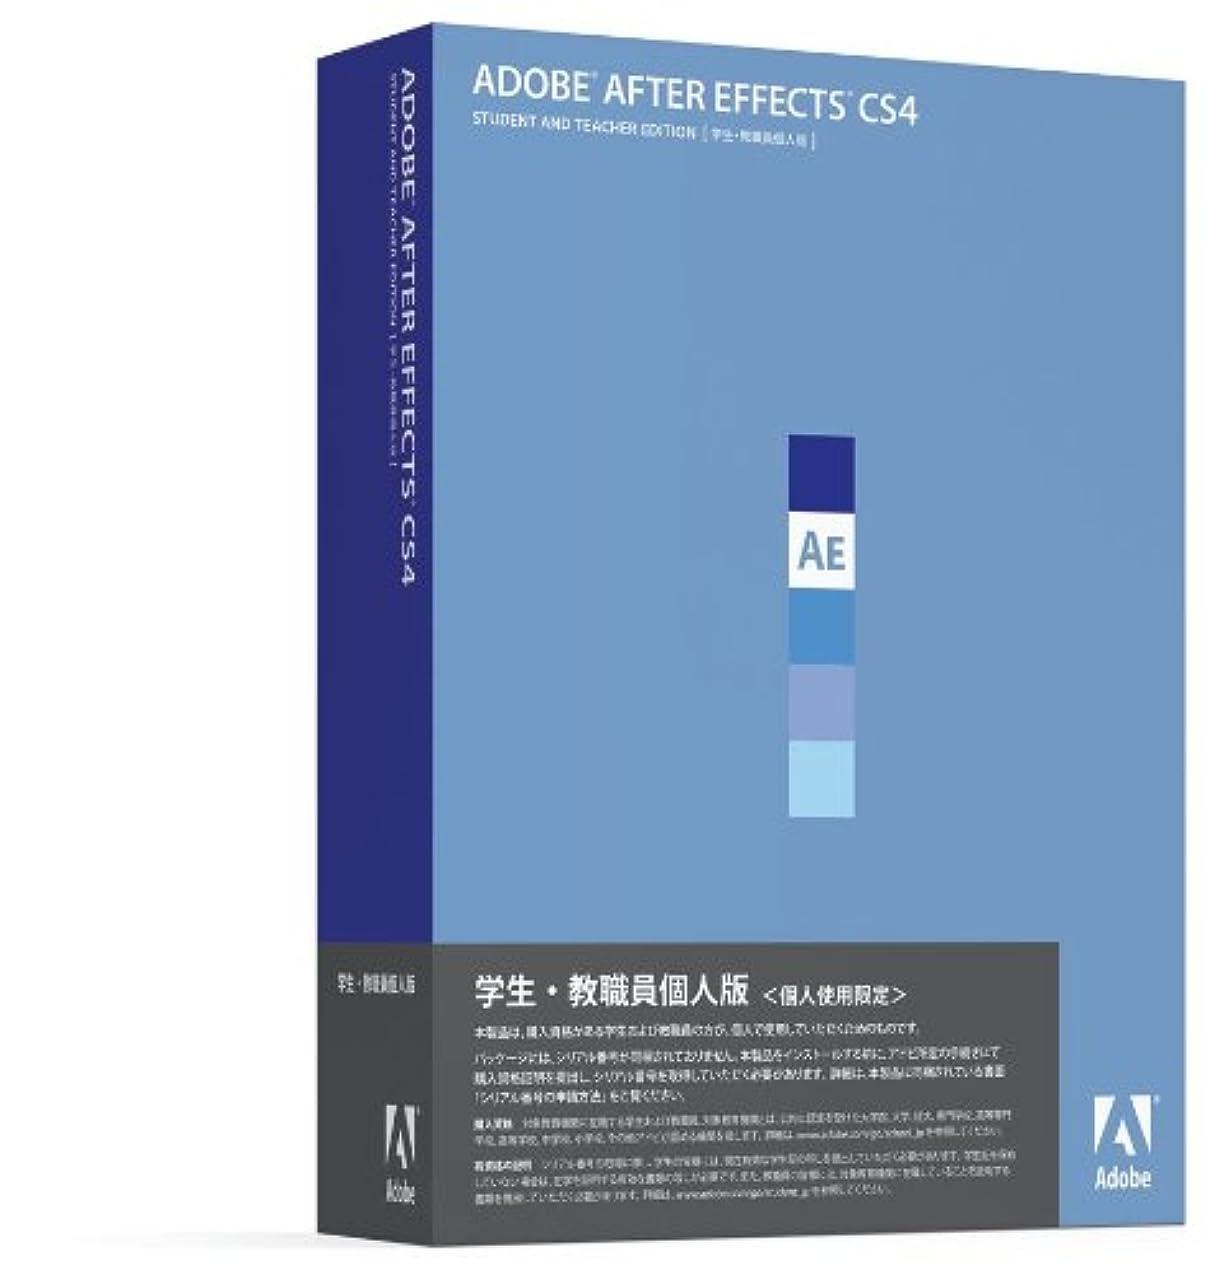 郵便物秋貝殻学生?教職員個人版 Adobe After Effects CS4 (V9.0) 日本語版 Professional Windows版 (要シリアル番号申請)